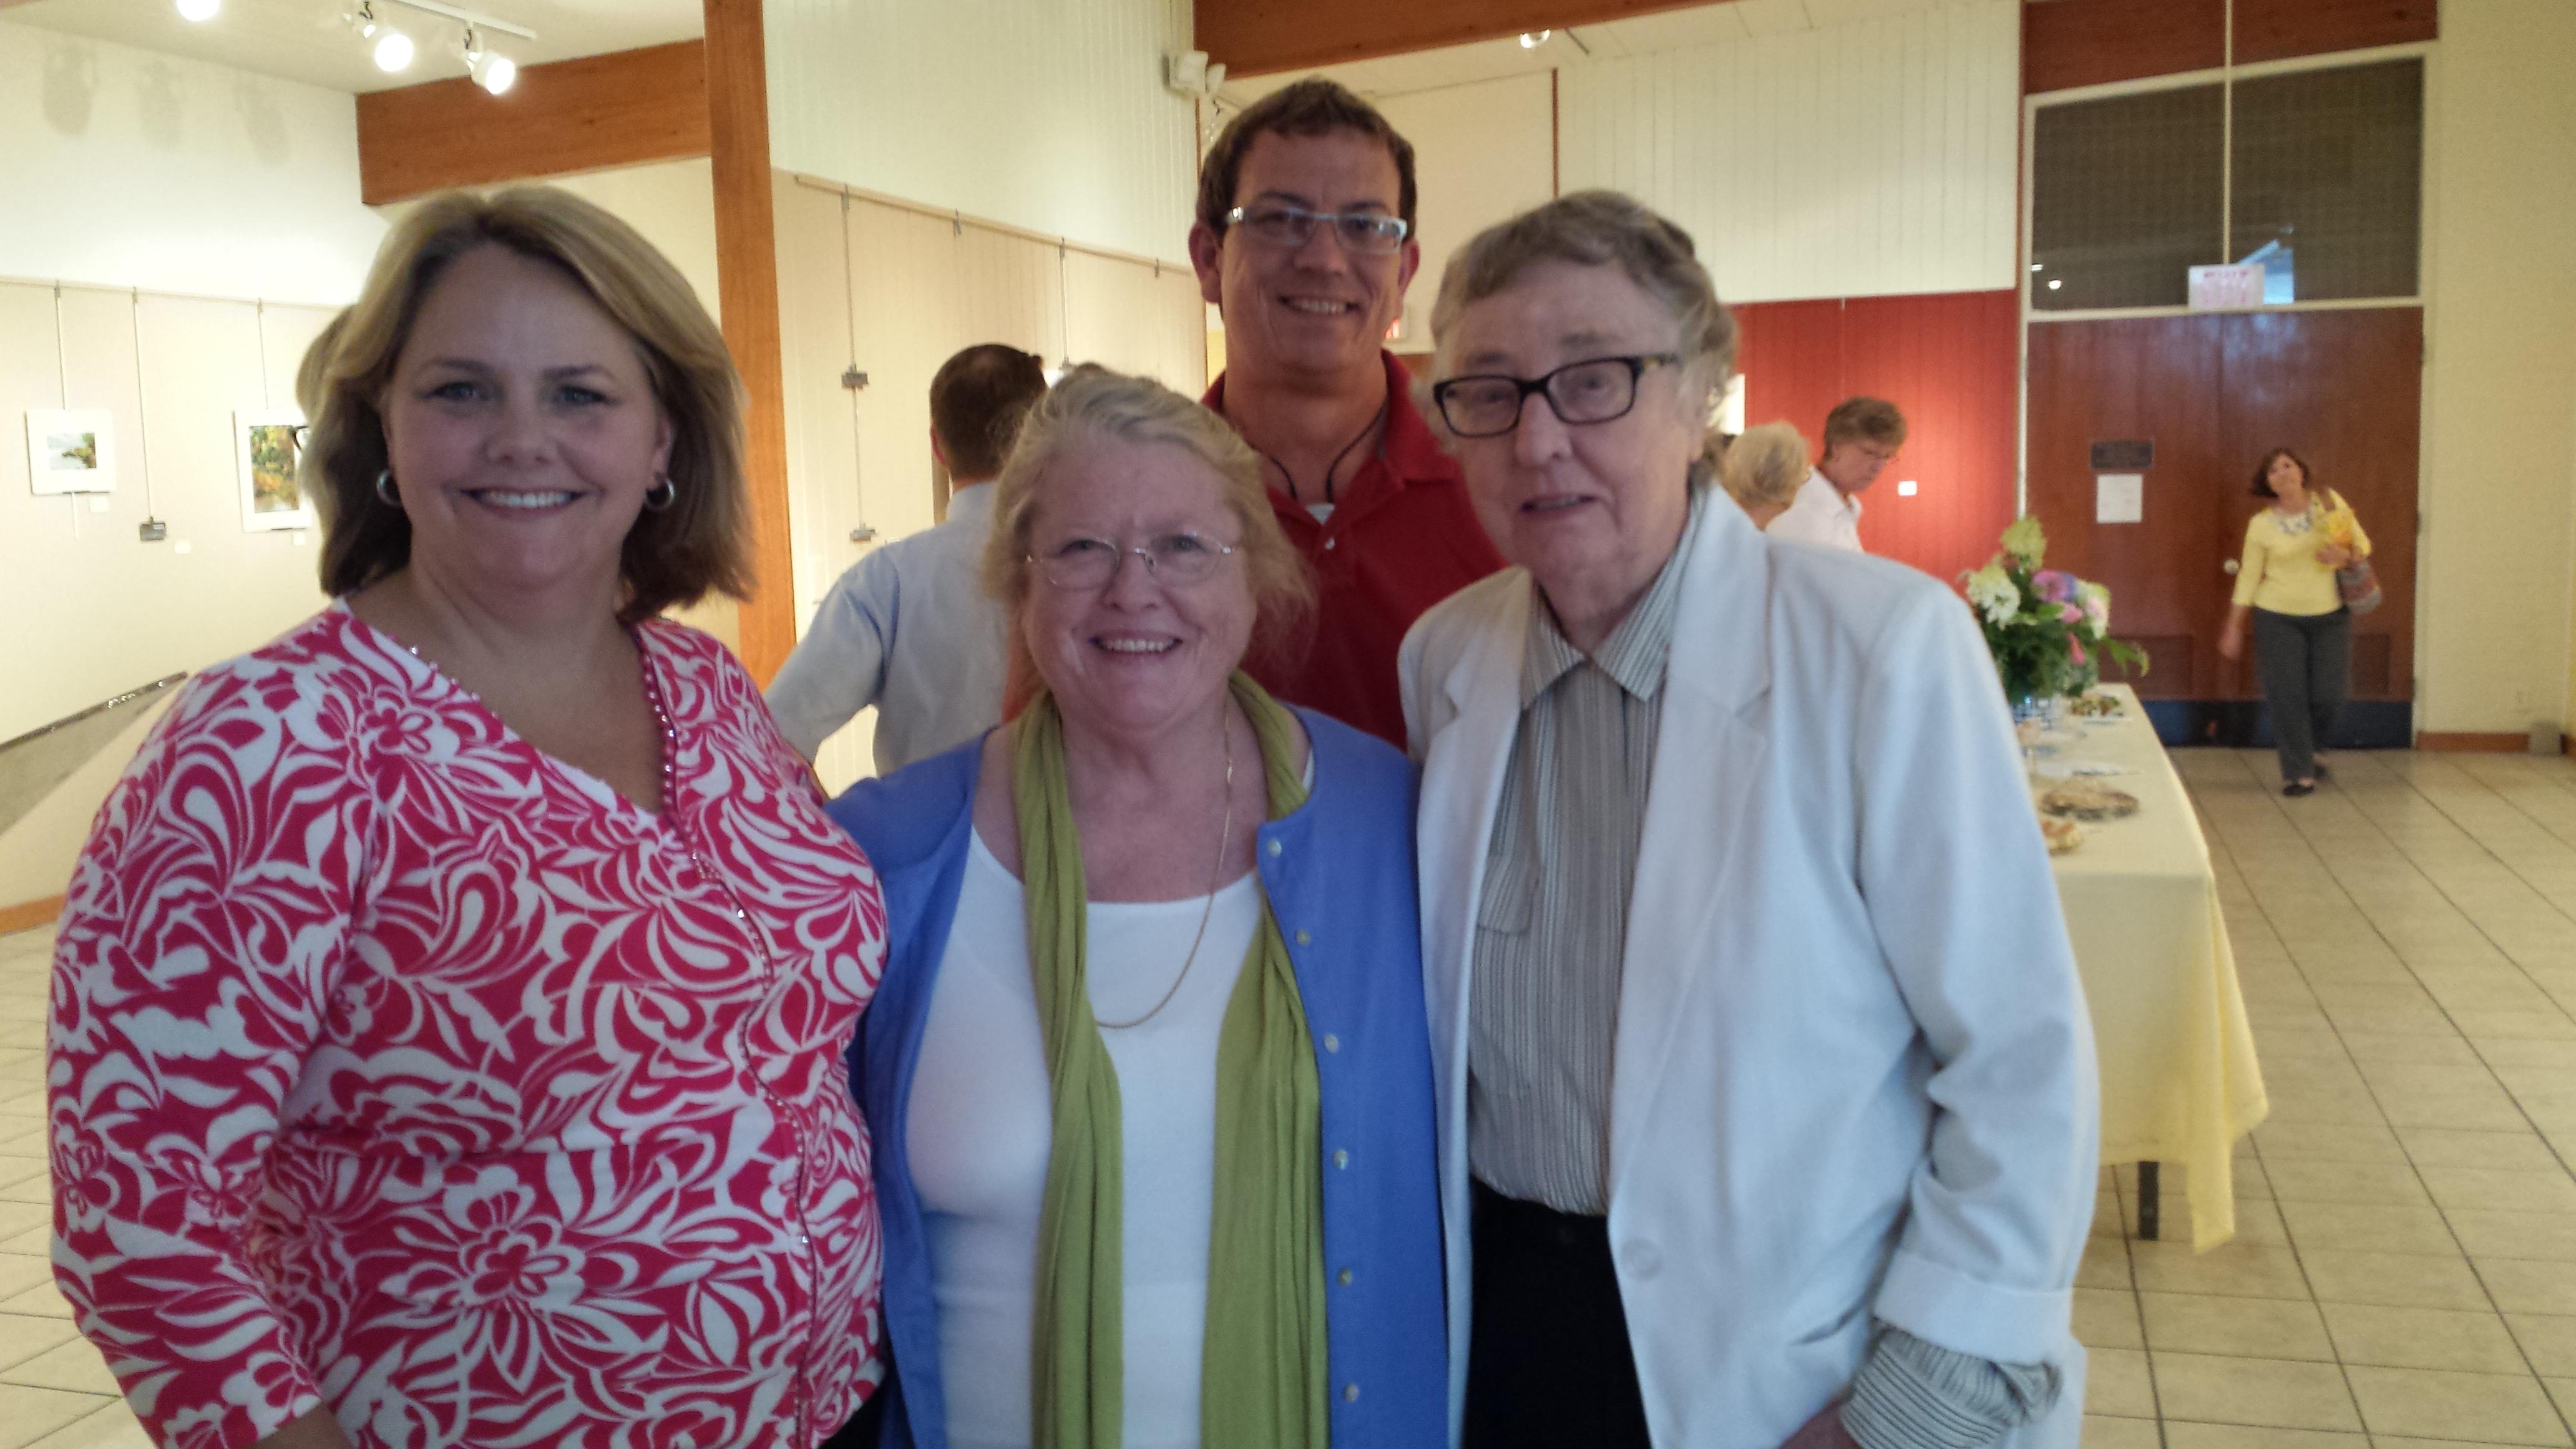 Mary Austin, Sue, and Mrs. Rawls